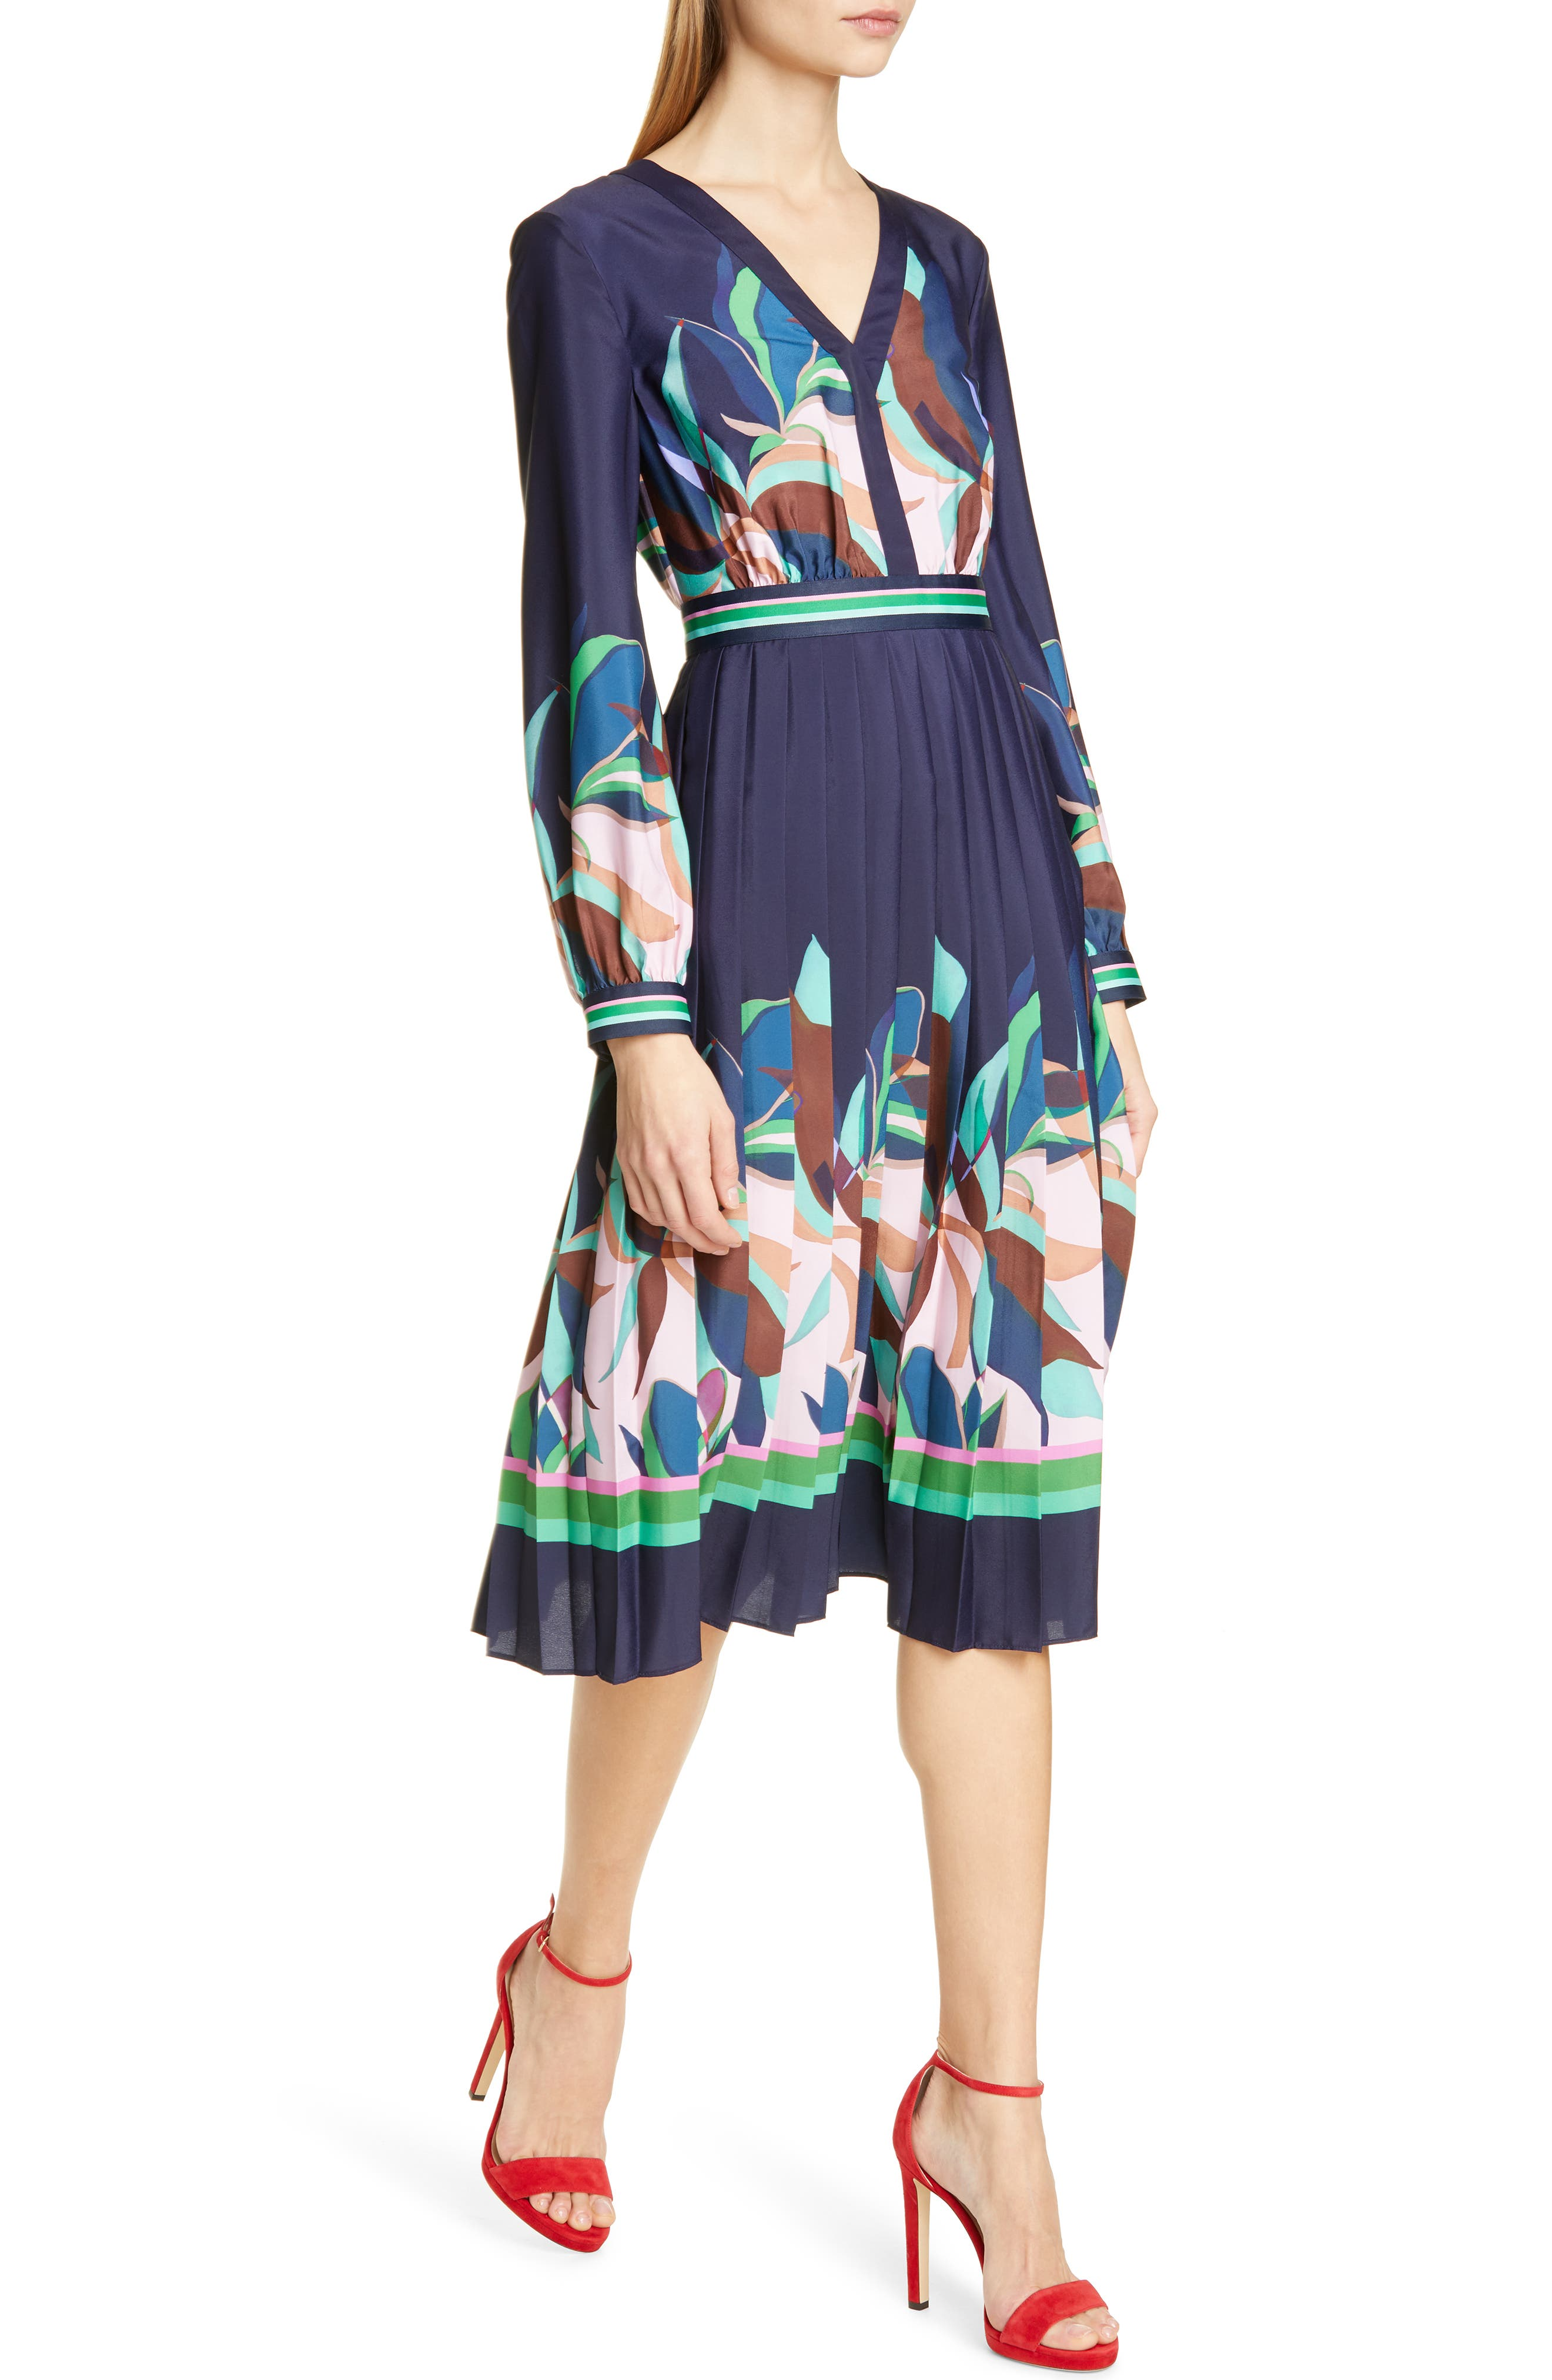 TED BAKER LONDON, Leonore Supernatural Fit & Flare Dress, Alternate thumbnail 4, color, NAVY